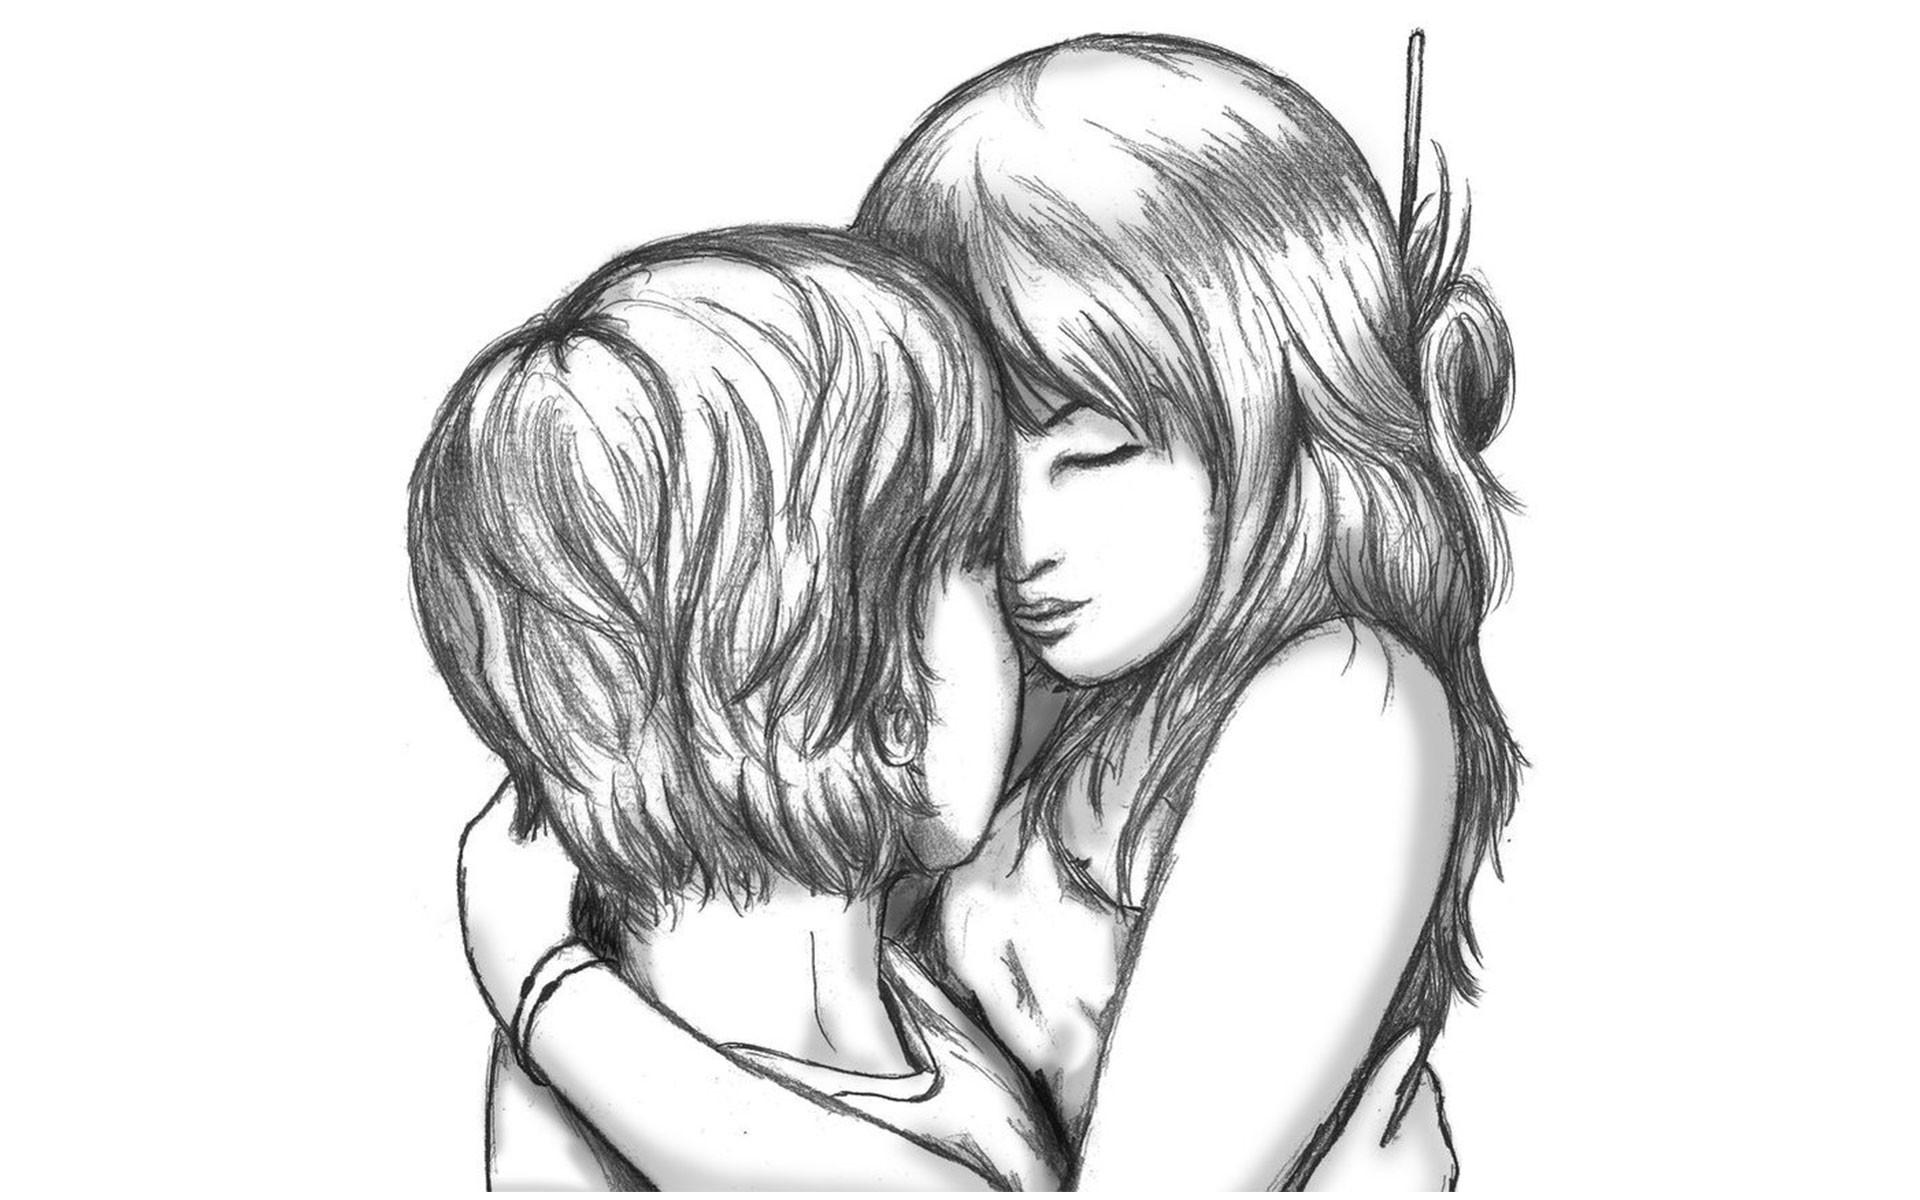 Love drawings pencil art hd romantic sketch wallpaper download · 1920x1080 standard